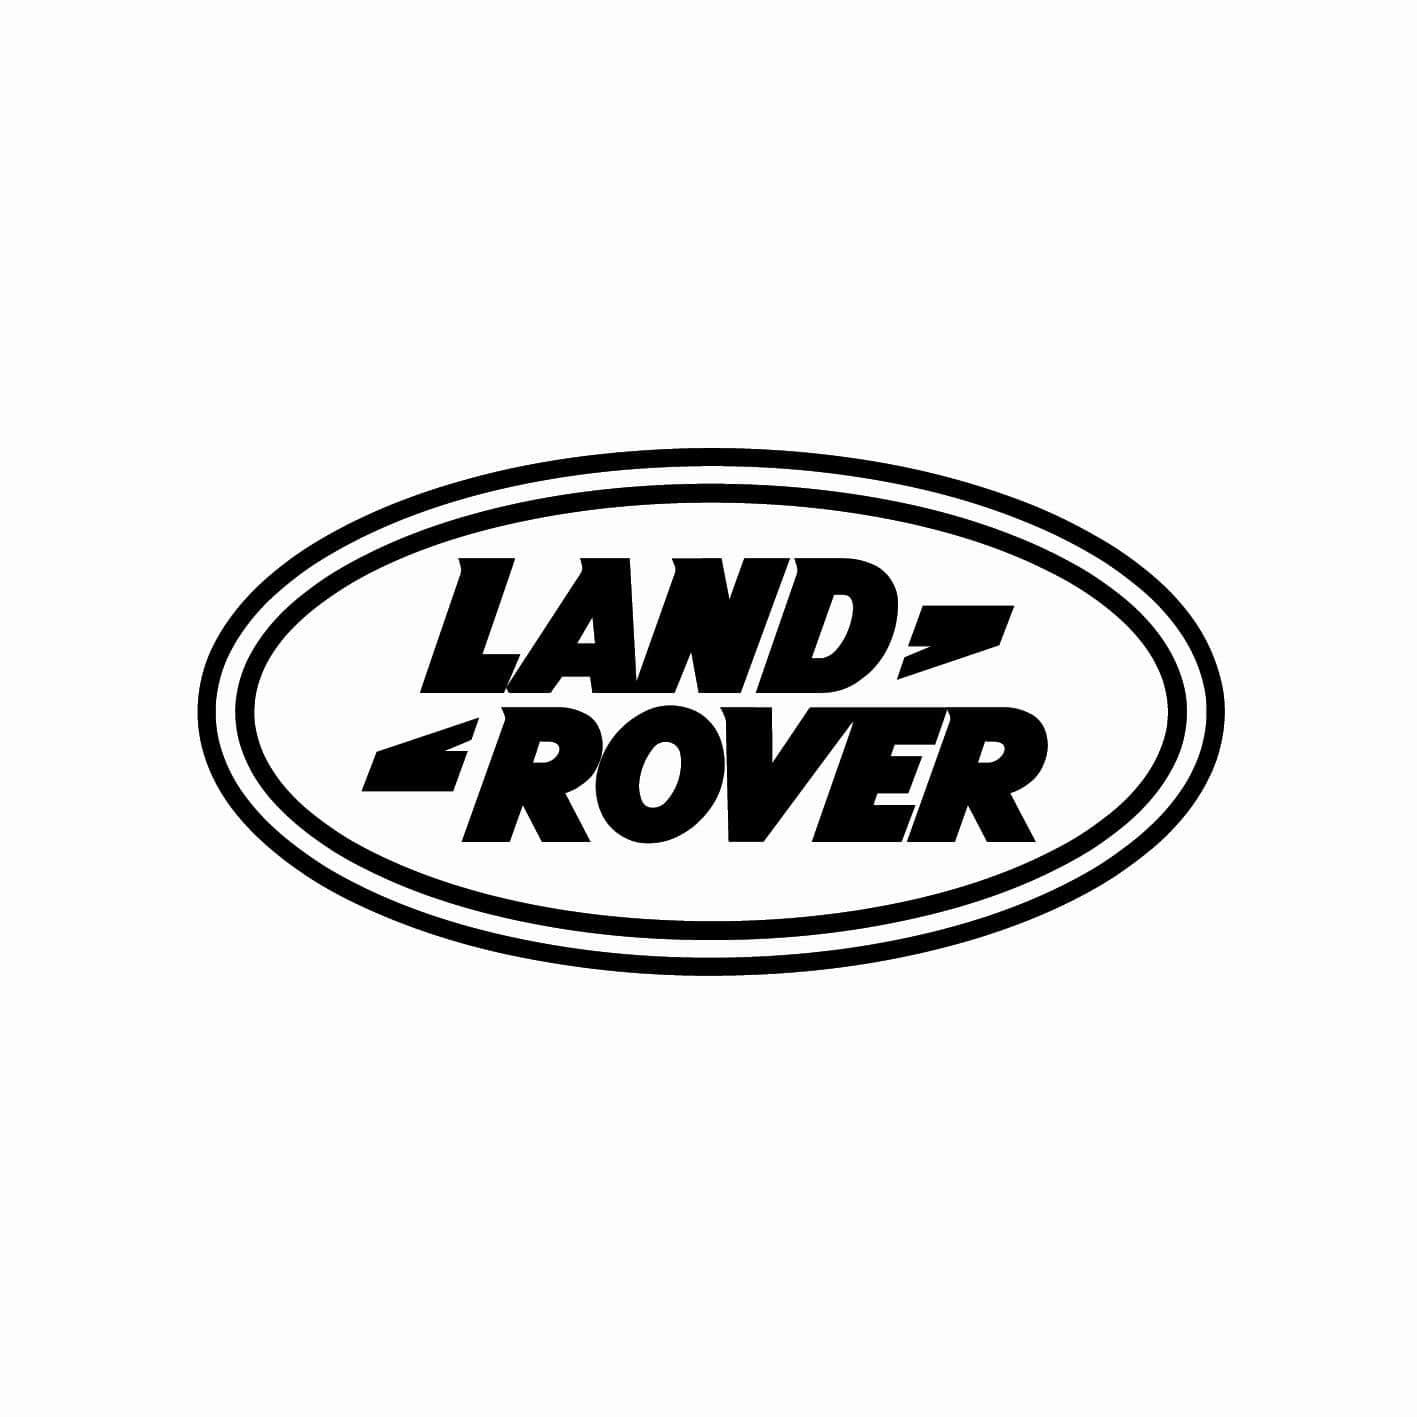 land-rover-ref19-stickers-sticker-autocollant-4x4-tuning-audio-4x4-tout-terrain-car-auto-moto-camion-competition-deco-rallye-racing-min